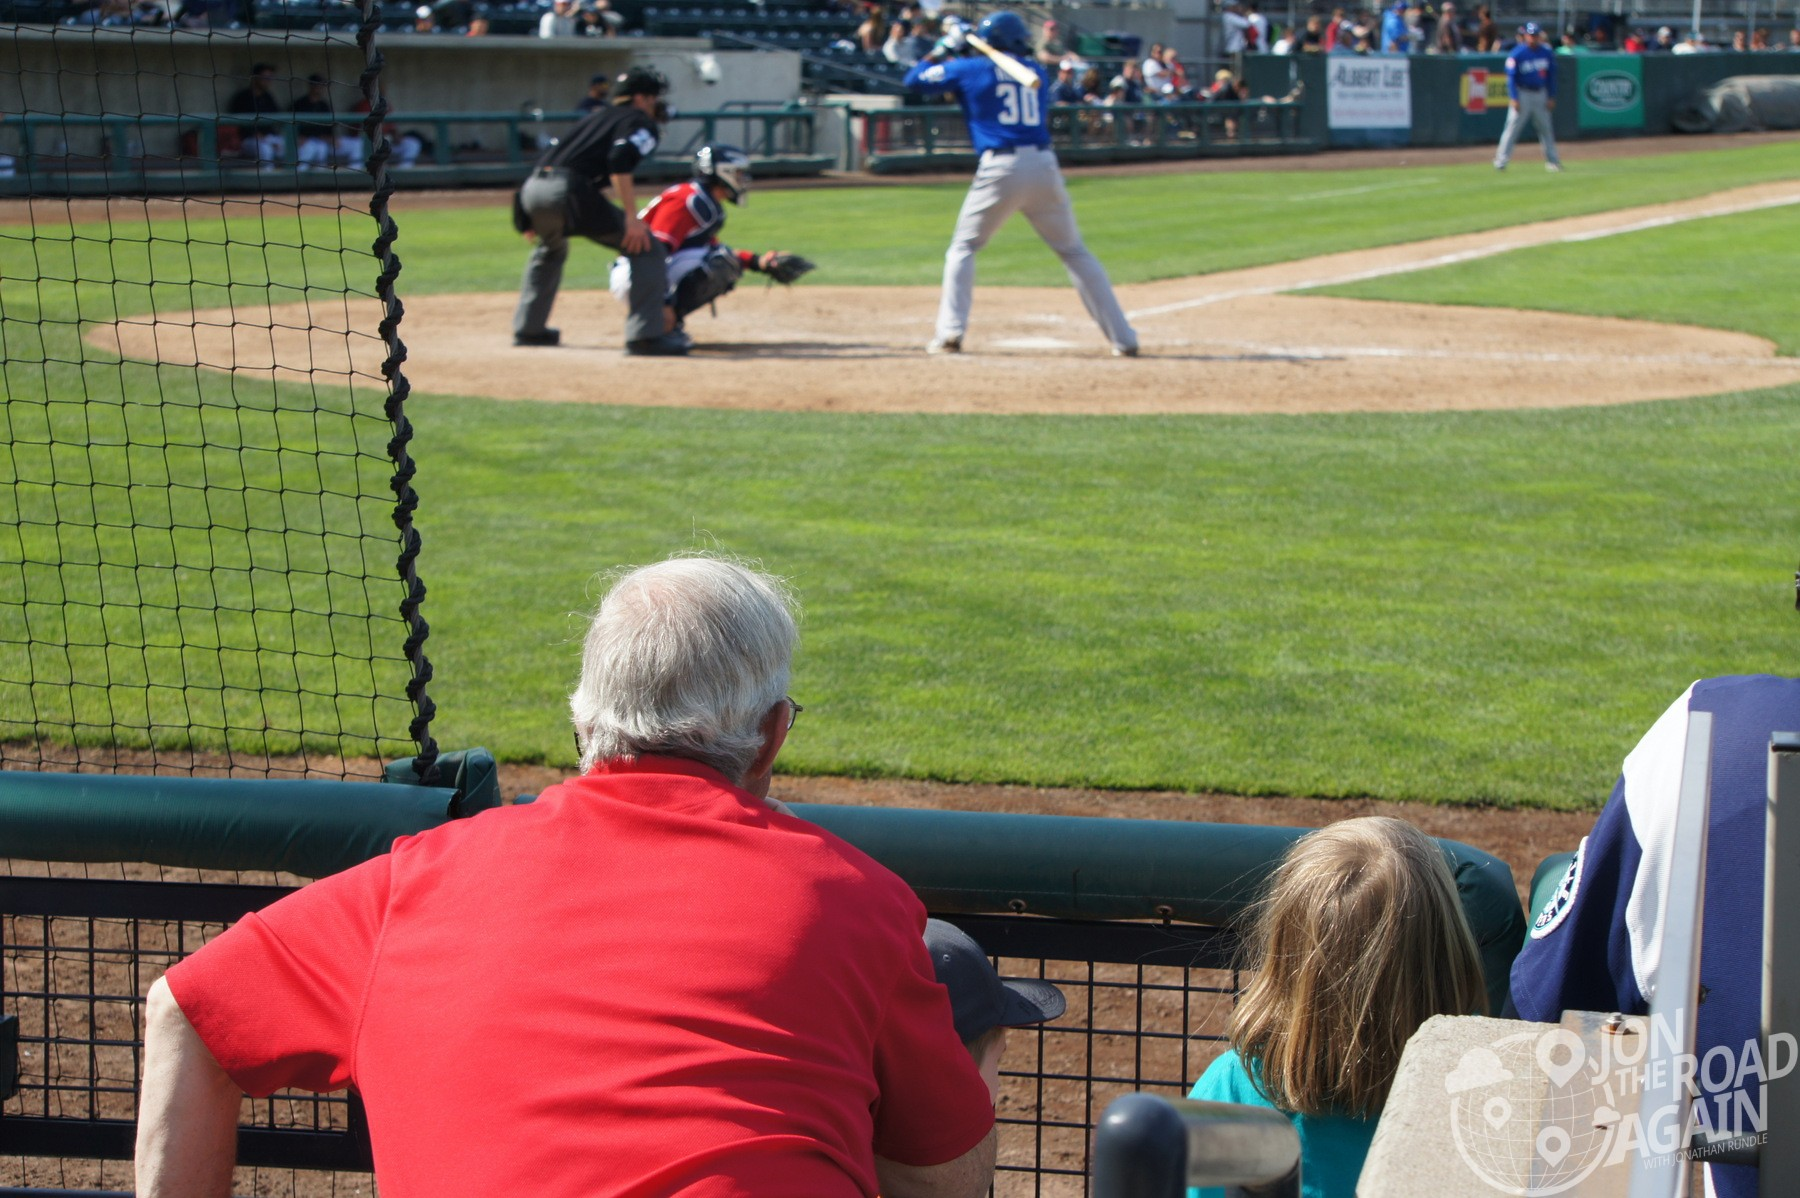 Rainiers Staff help the kids get a baseball